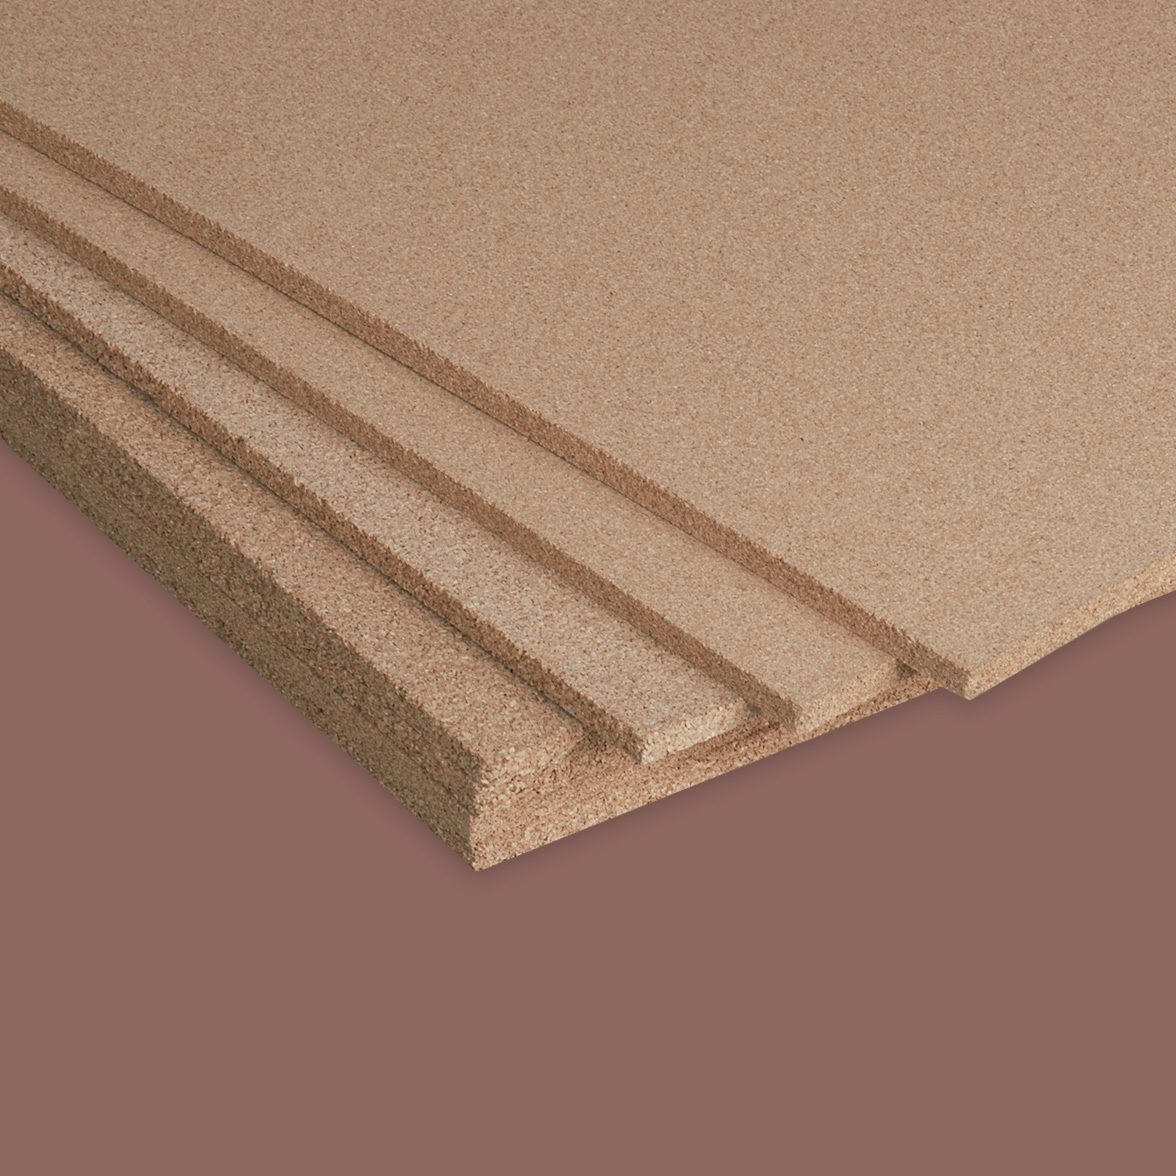 3 8 Thick Cork Sheets